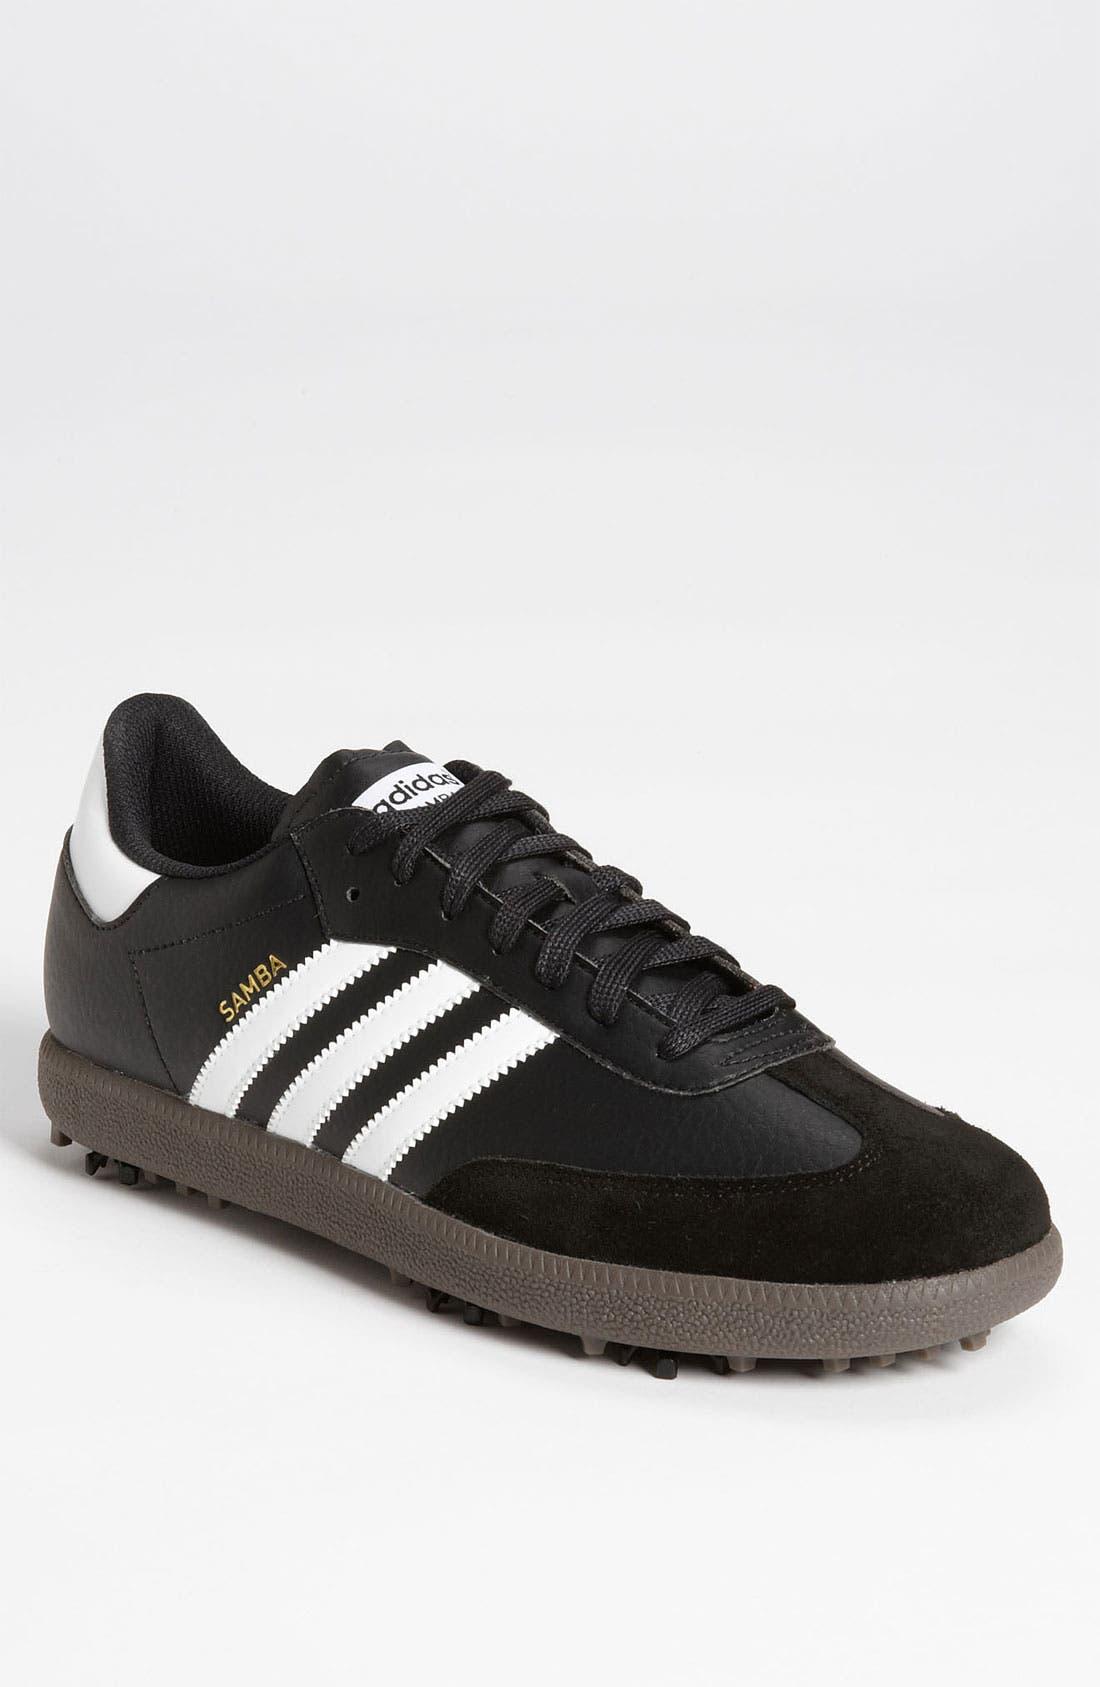 Alternate Image 1 Selected - adidas TaylorMade 'Samba' Golf Shoe (Men) (Online Only)